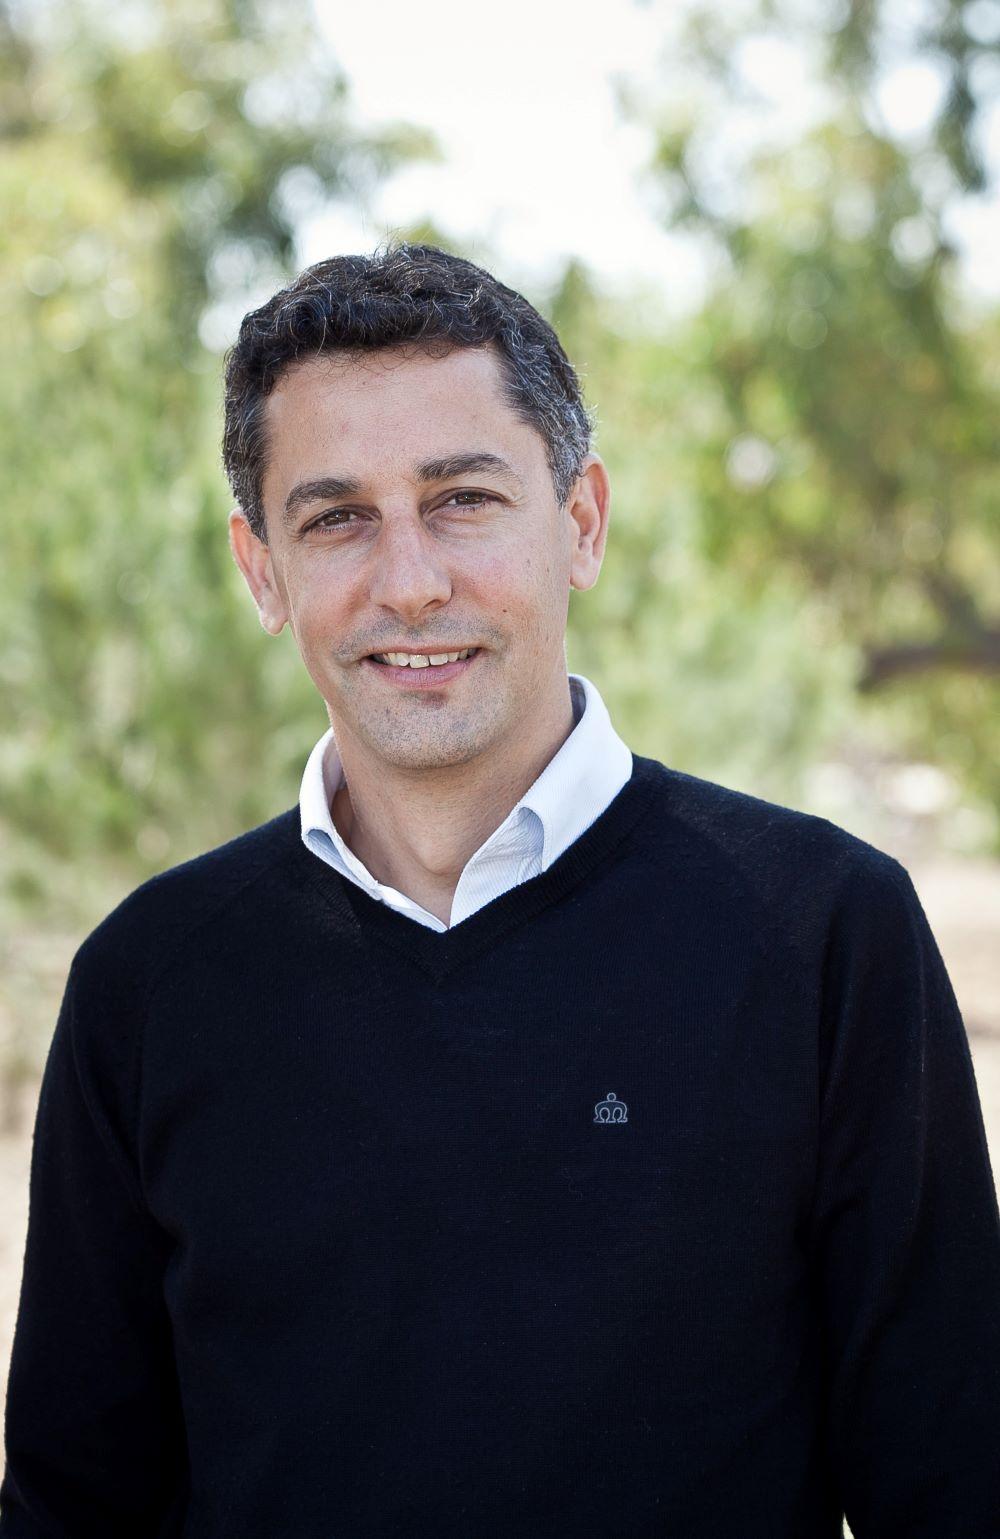 Ian Casolani